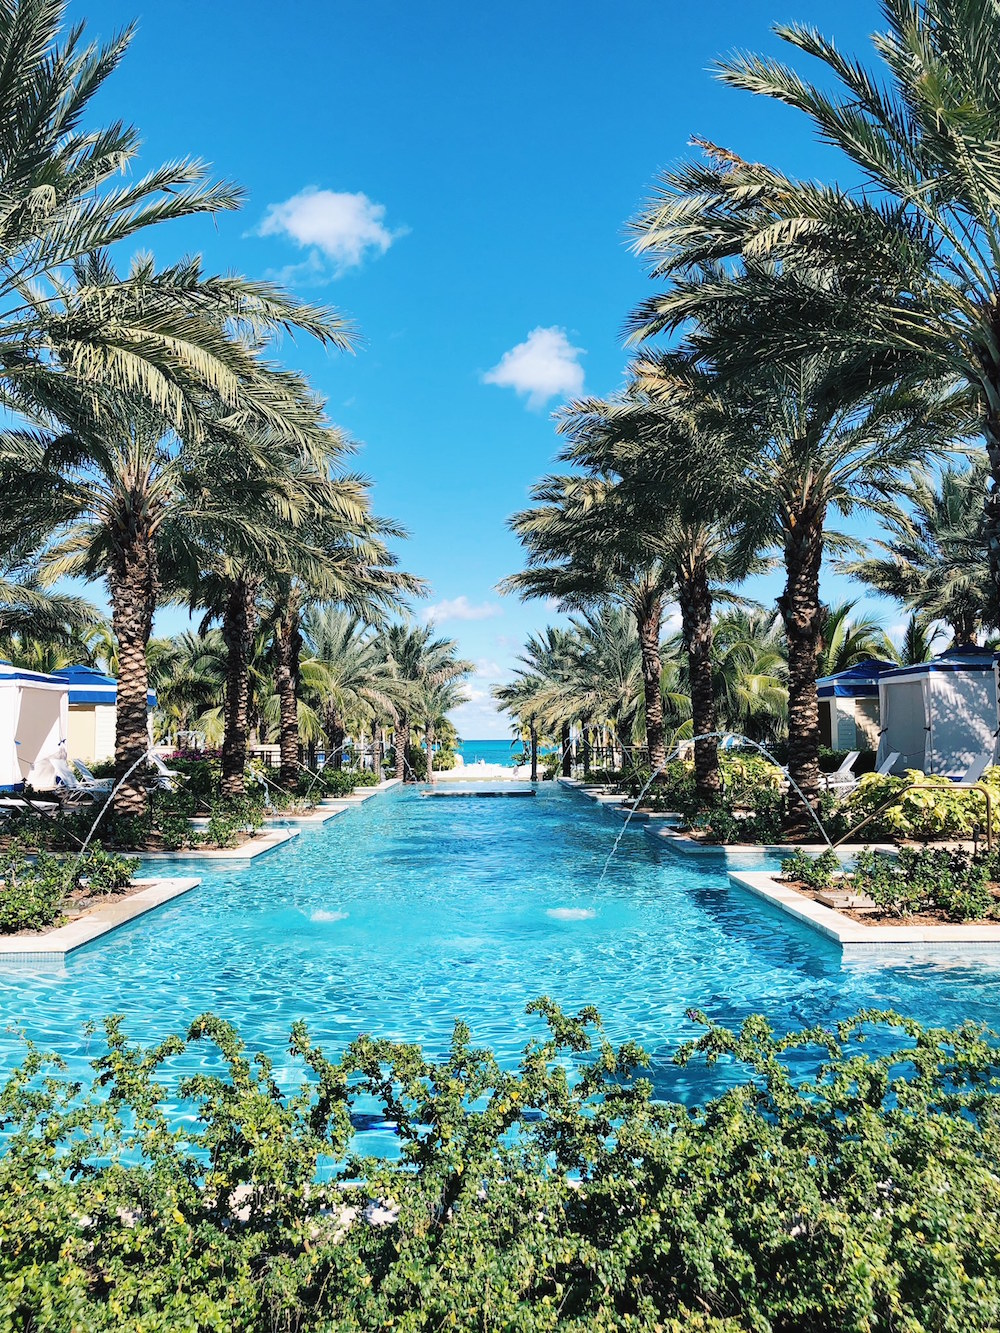 Grand Hyatt Baha Mar Bahamas resort pool palm trees